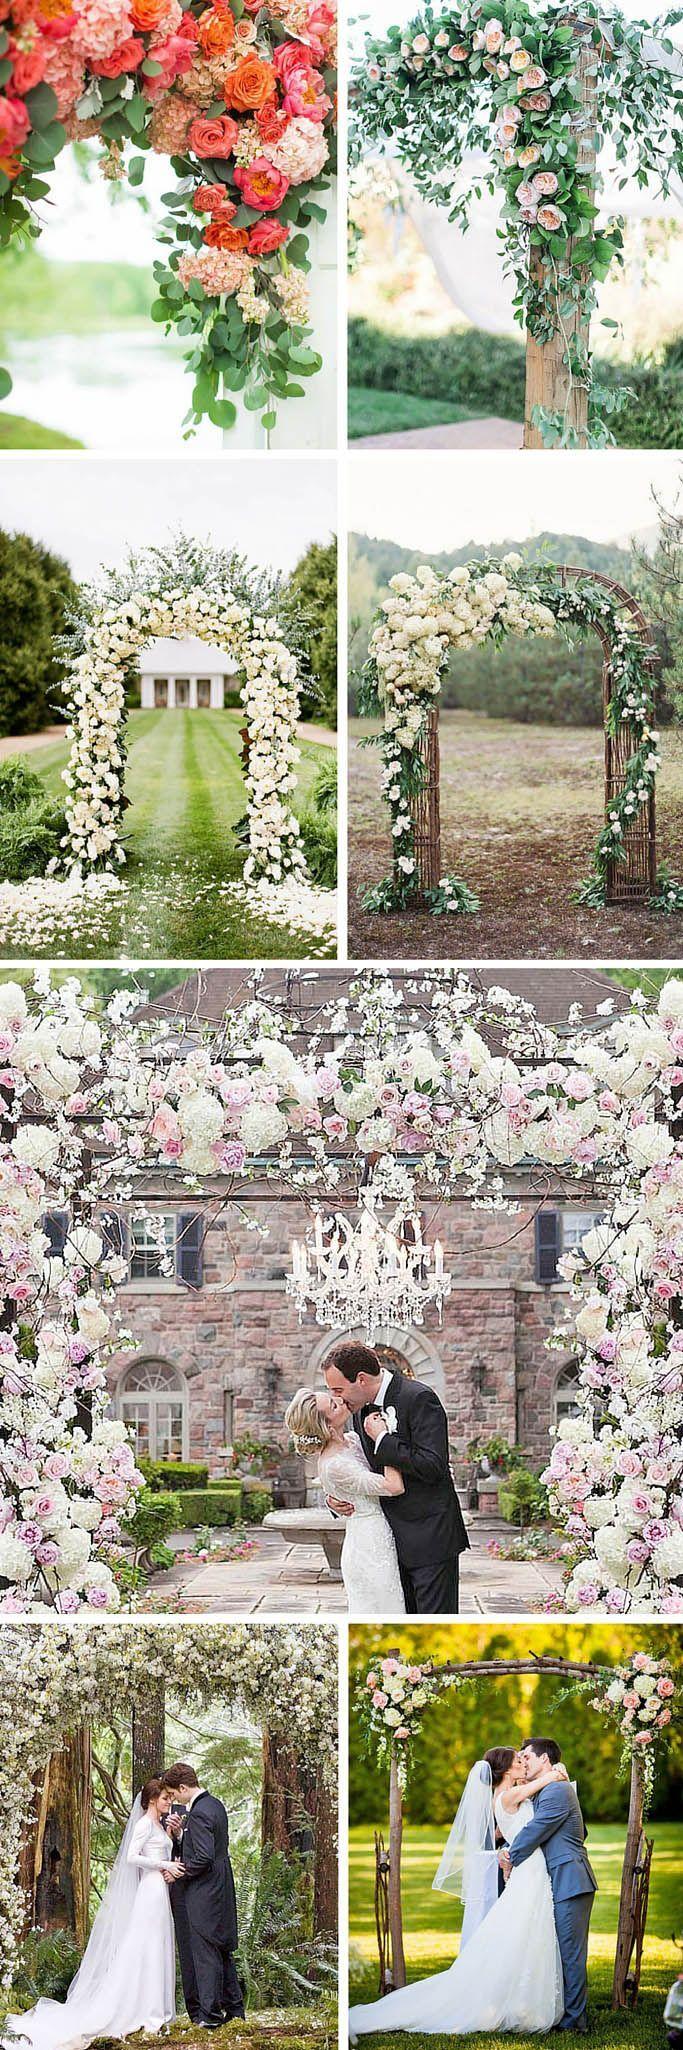 Best 25+ Wedding arch decorations ideas on Pinterest | Wedding ...